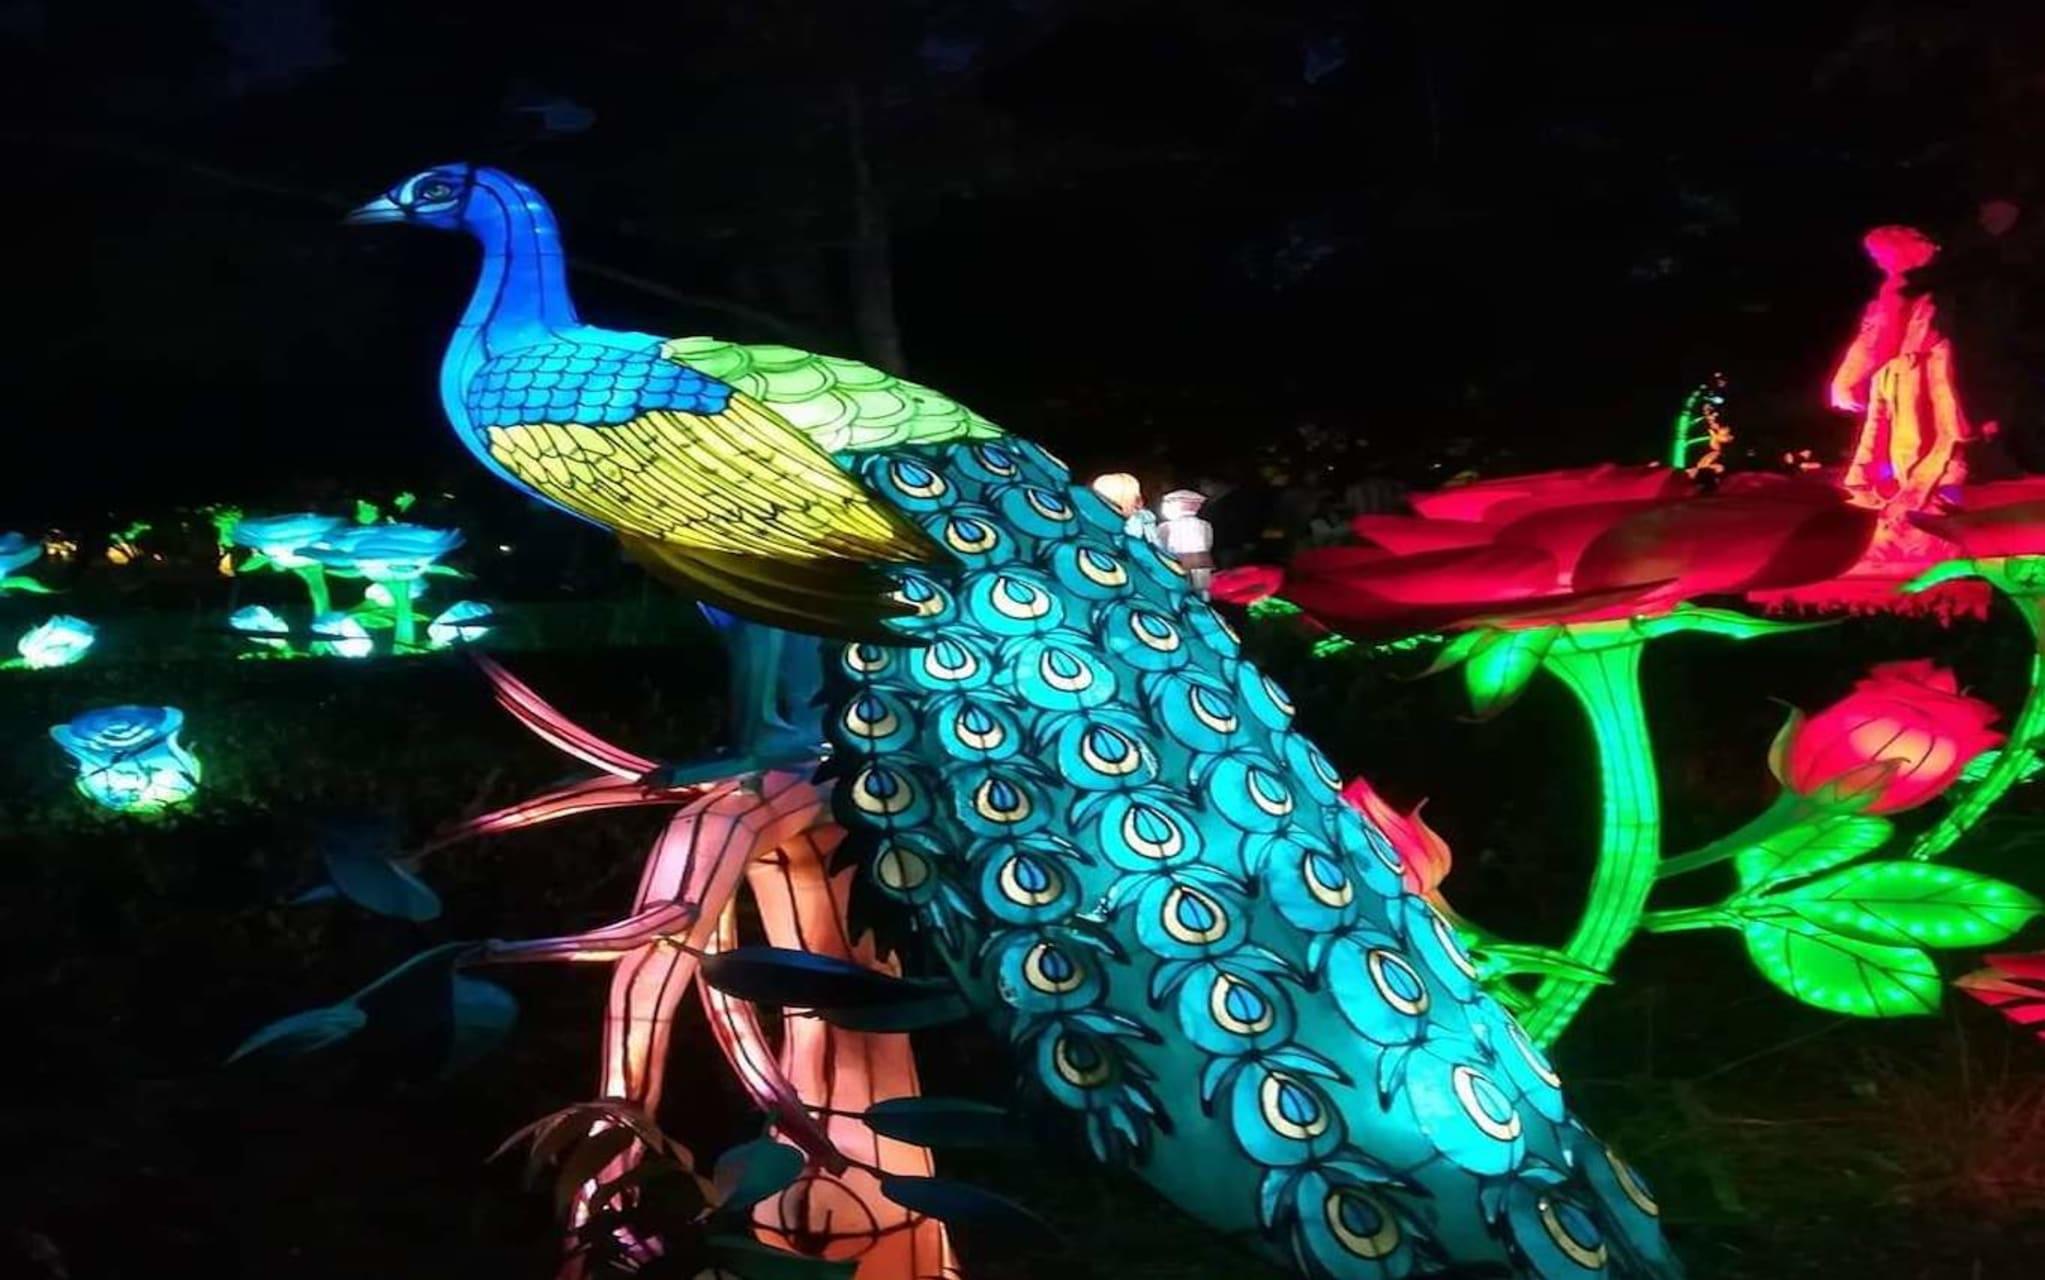 Porto - Magical Garden - An Immersive Nature Show